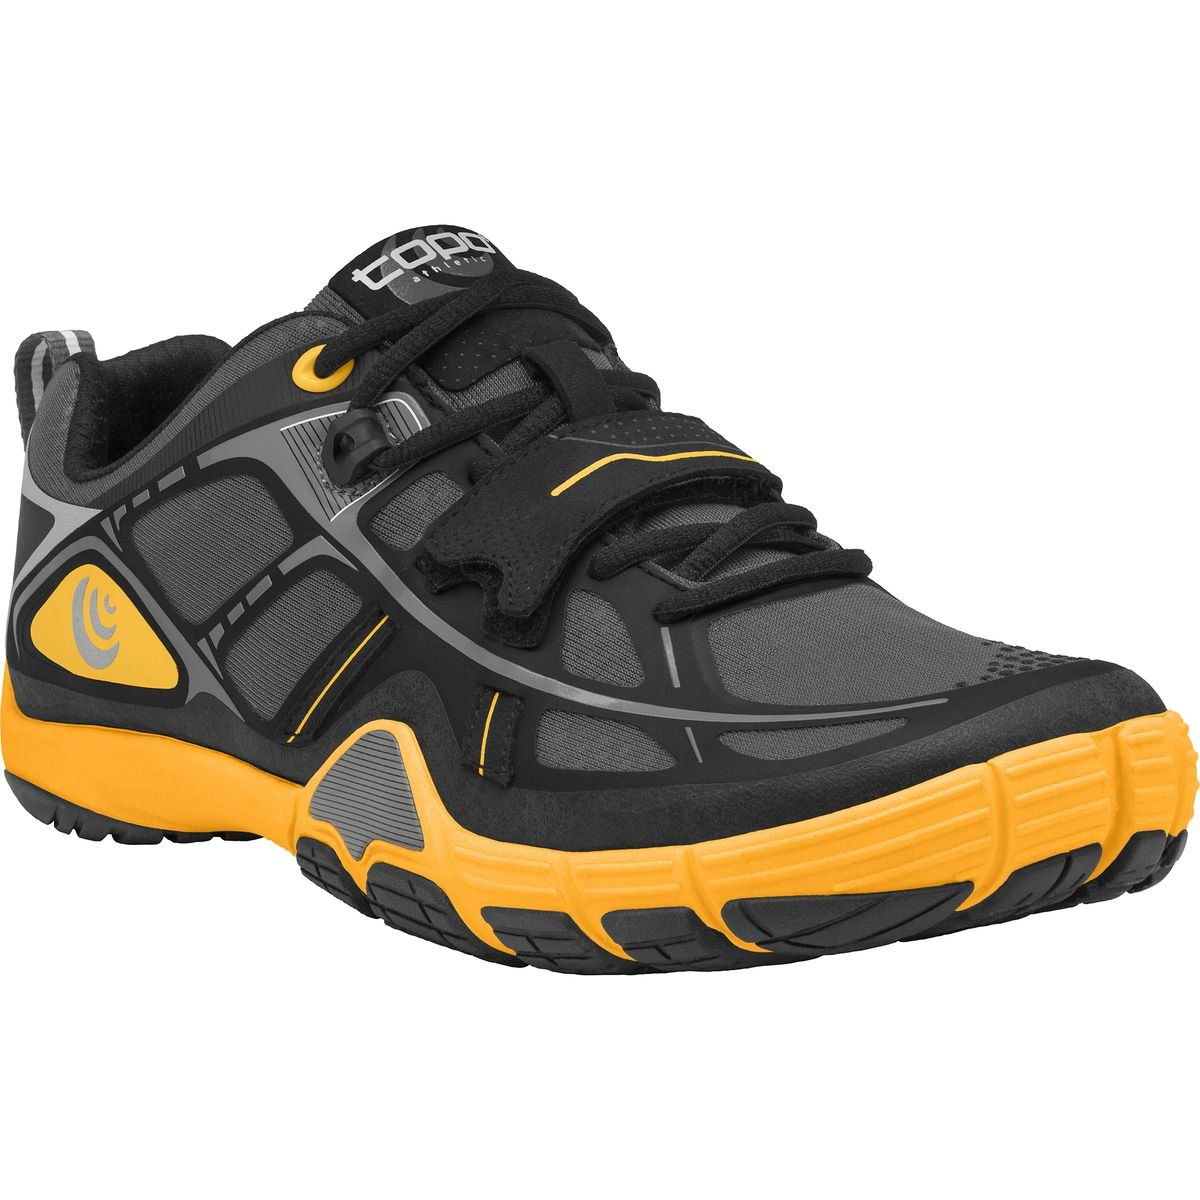 Topo Athletic Fli-Lyte Running Shoe - Men's B00TQ6MF5C 11 D(M) US Charcoal/Mango